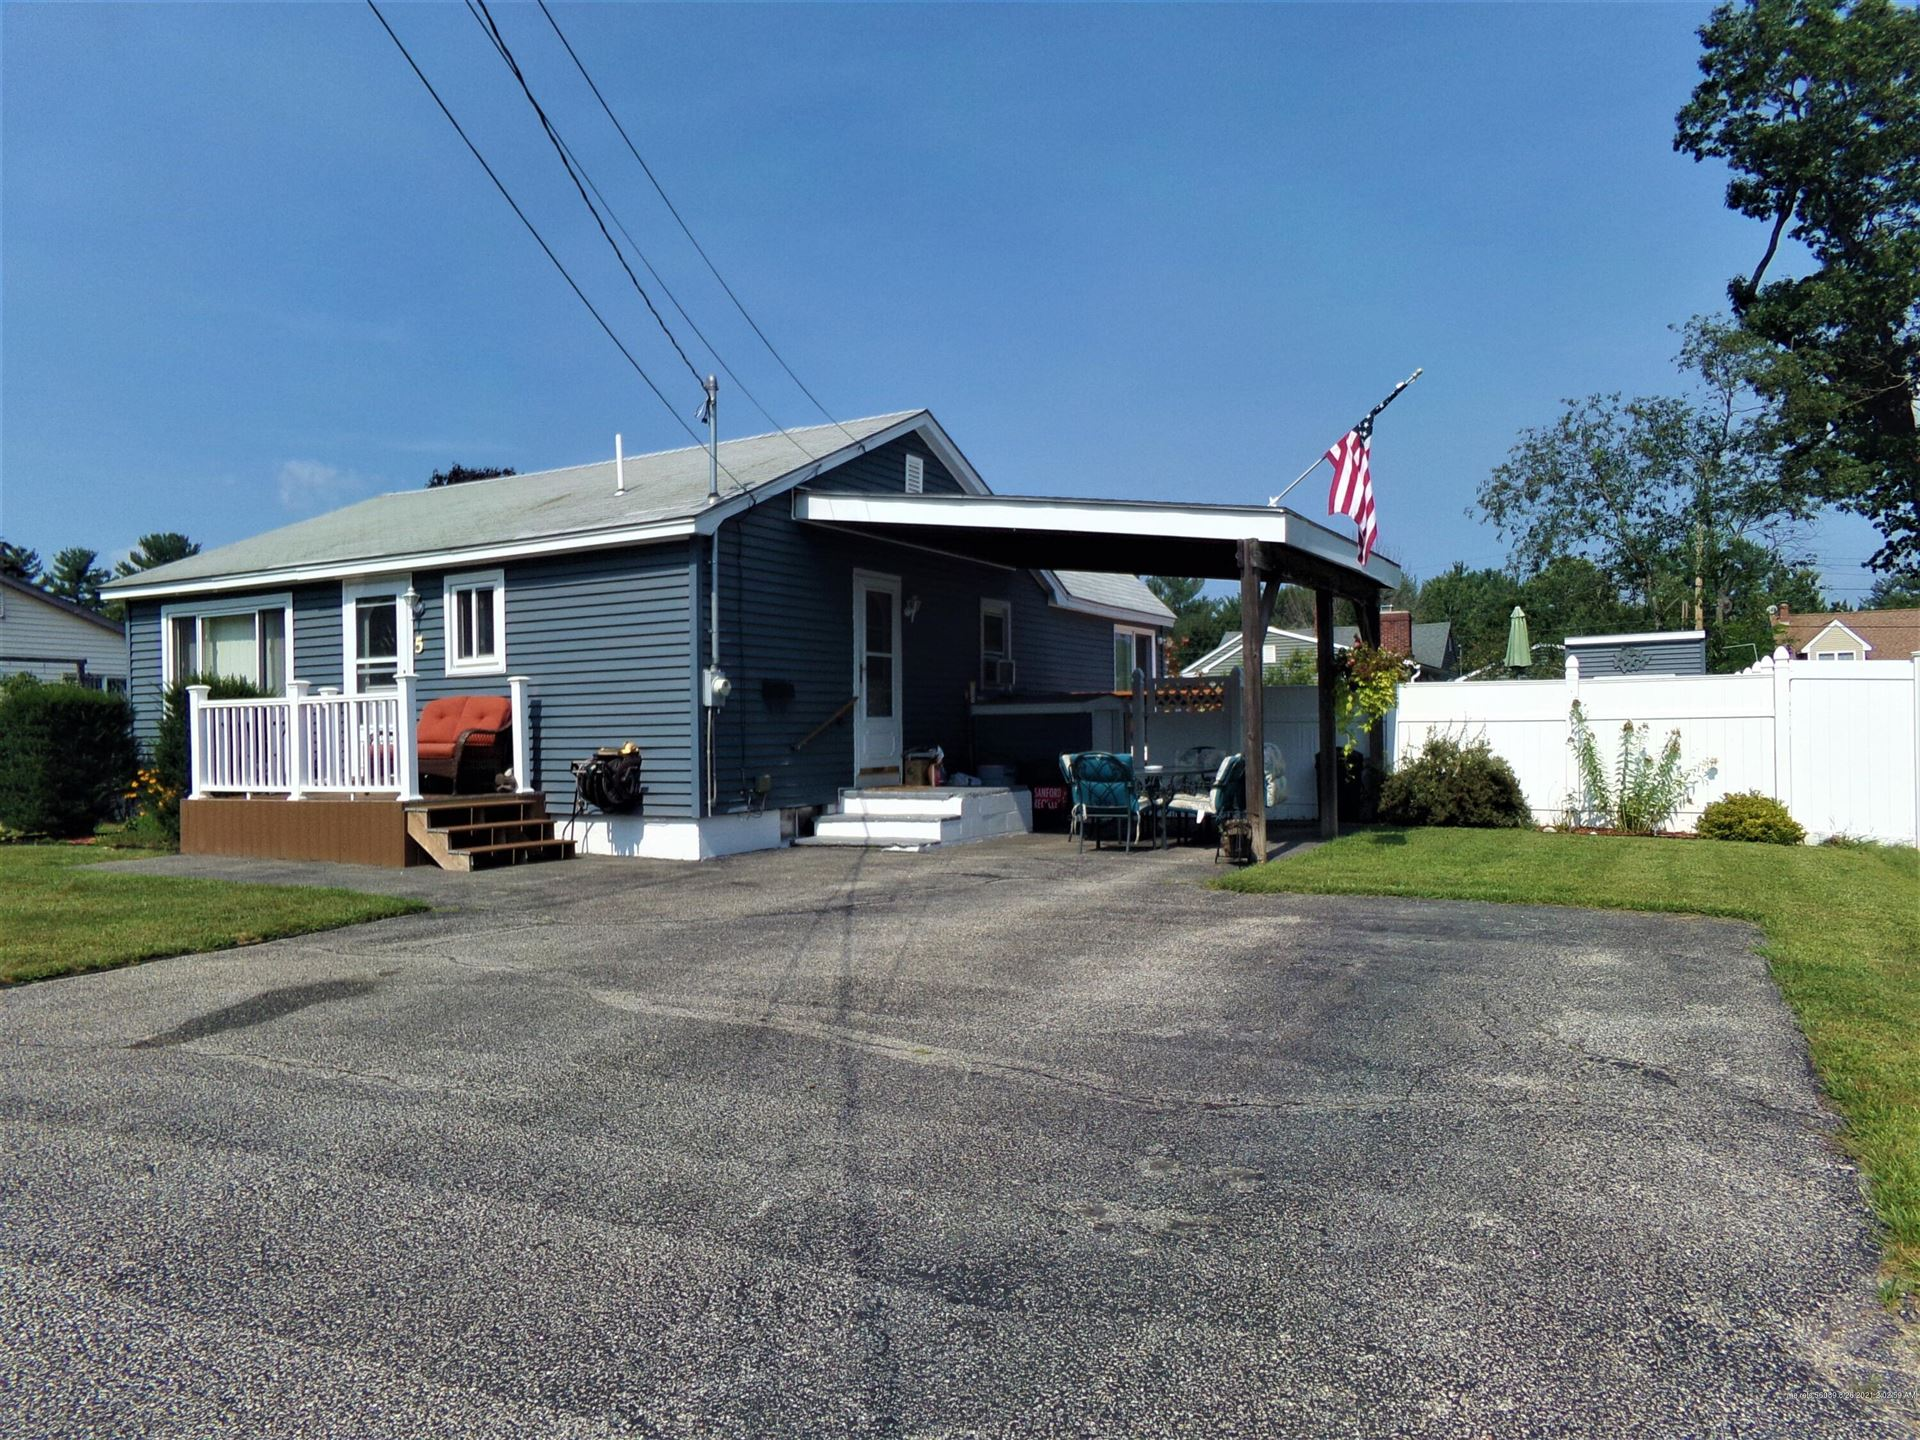 Photo of 5 Ruth Street, Sanford, ME 04073 (MLS # 1497042)